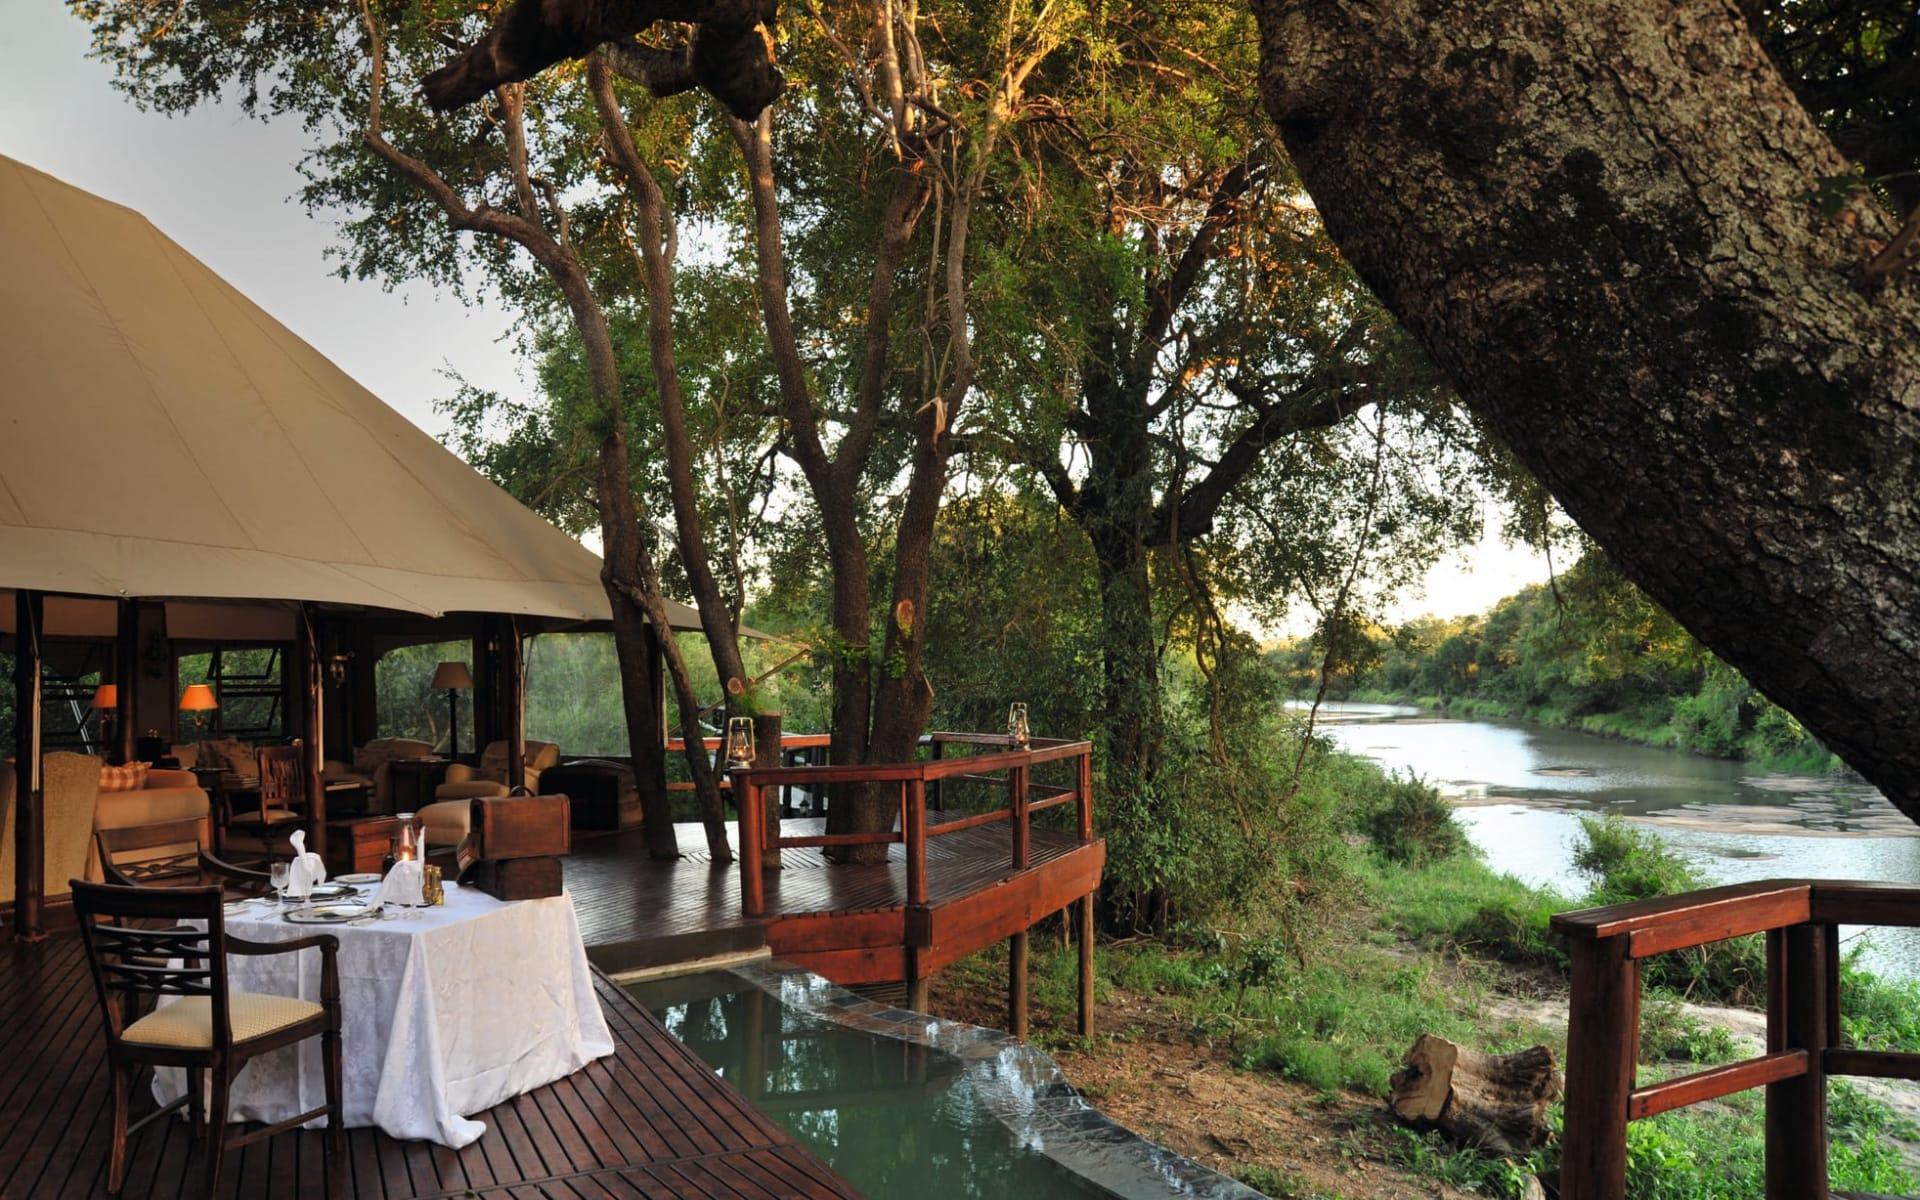 Hamiltons Tented Camp in Krüger Nationalpark: Hamiltons Tented Camp - Restaurant von aussen